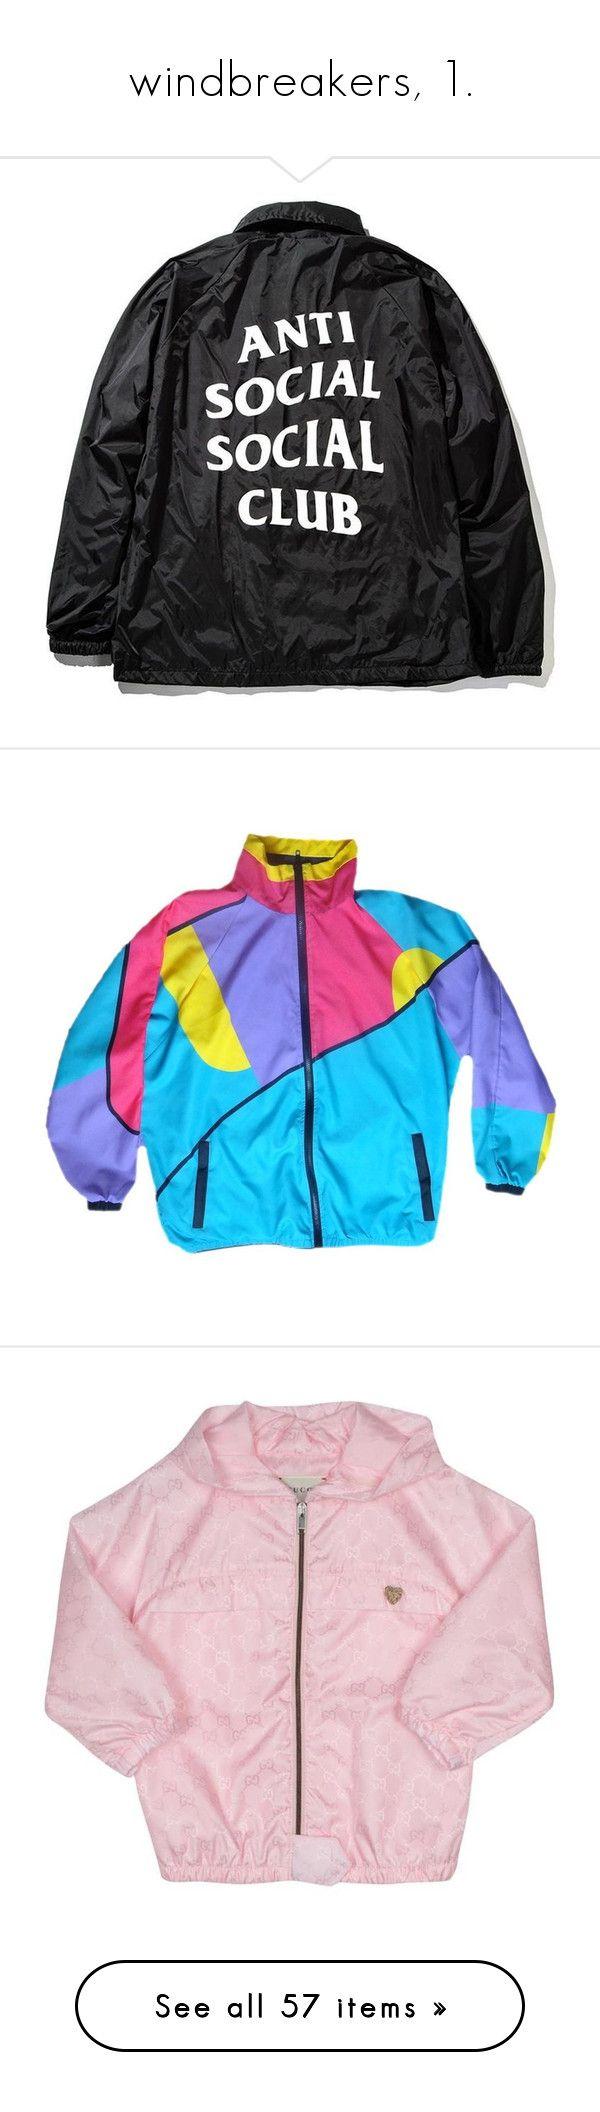 """windbreakers, 1."" by originalimanim ❤ liked on Polyvore featuring outerwear, jackets, tops, wind breaker jacket, windcheater jacket, wind jacket, vinyl jacket, coach jacket, activewear and activewear jackets"